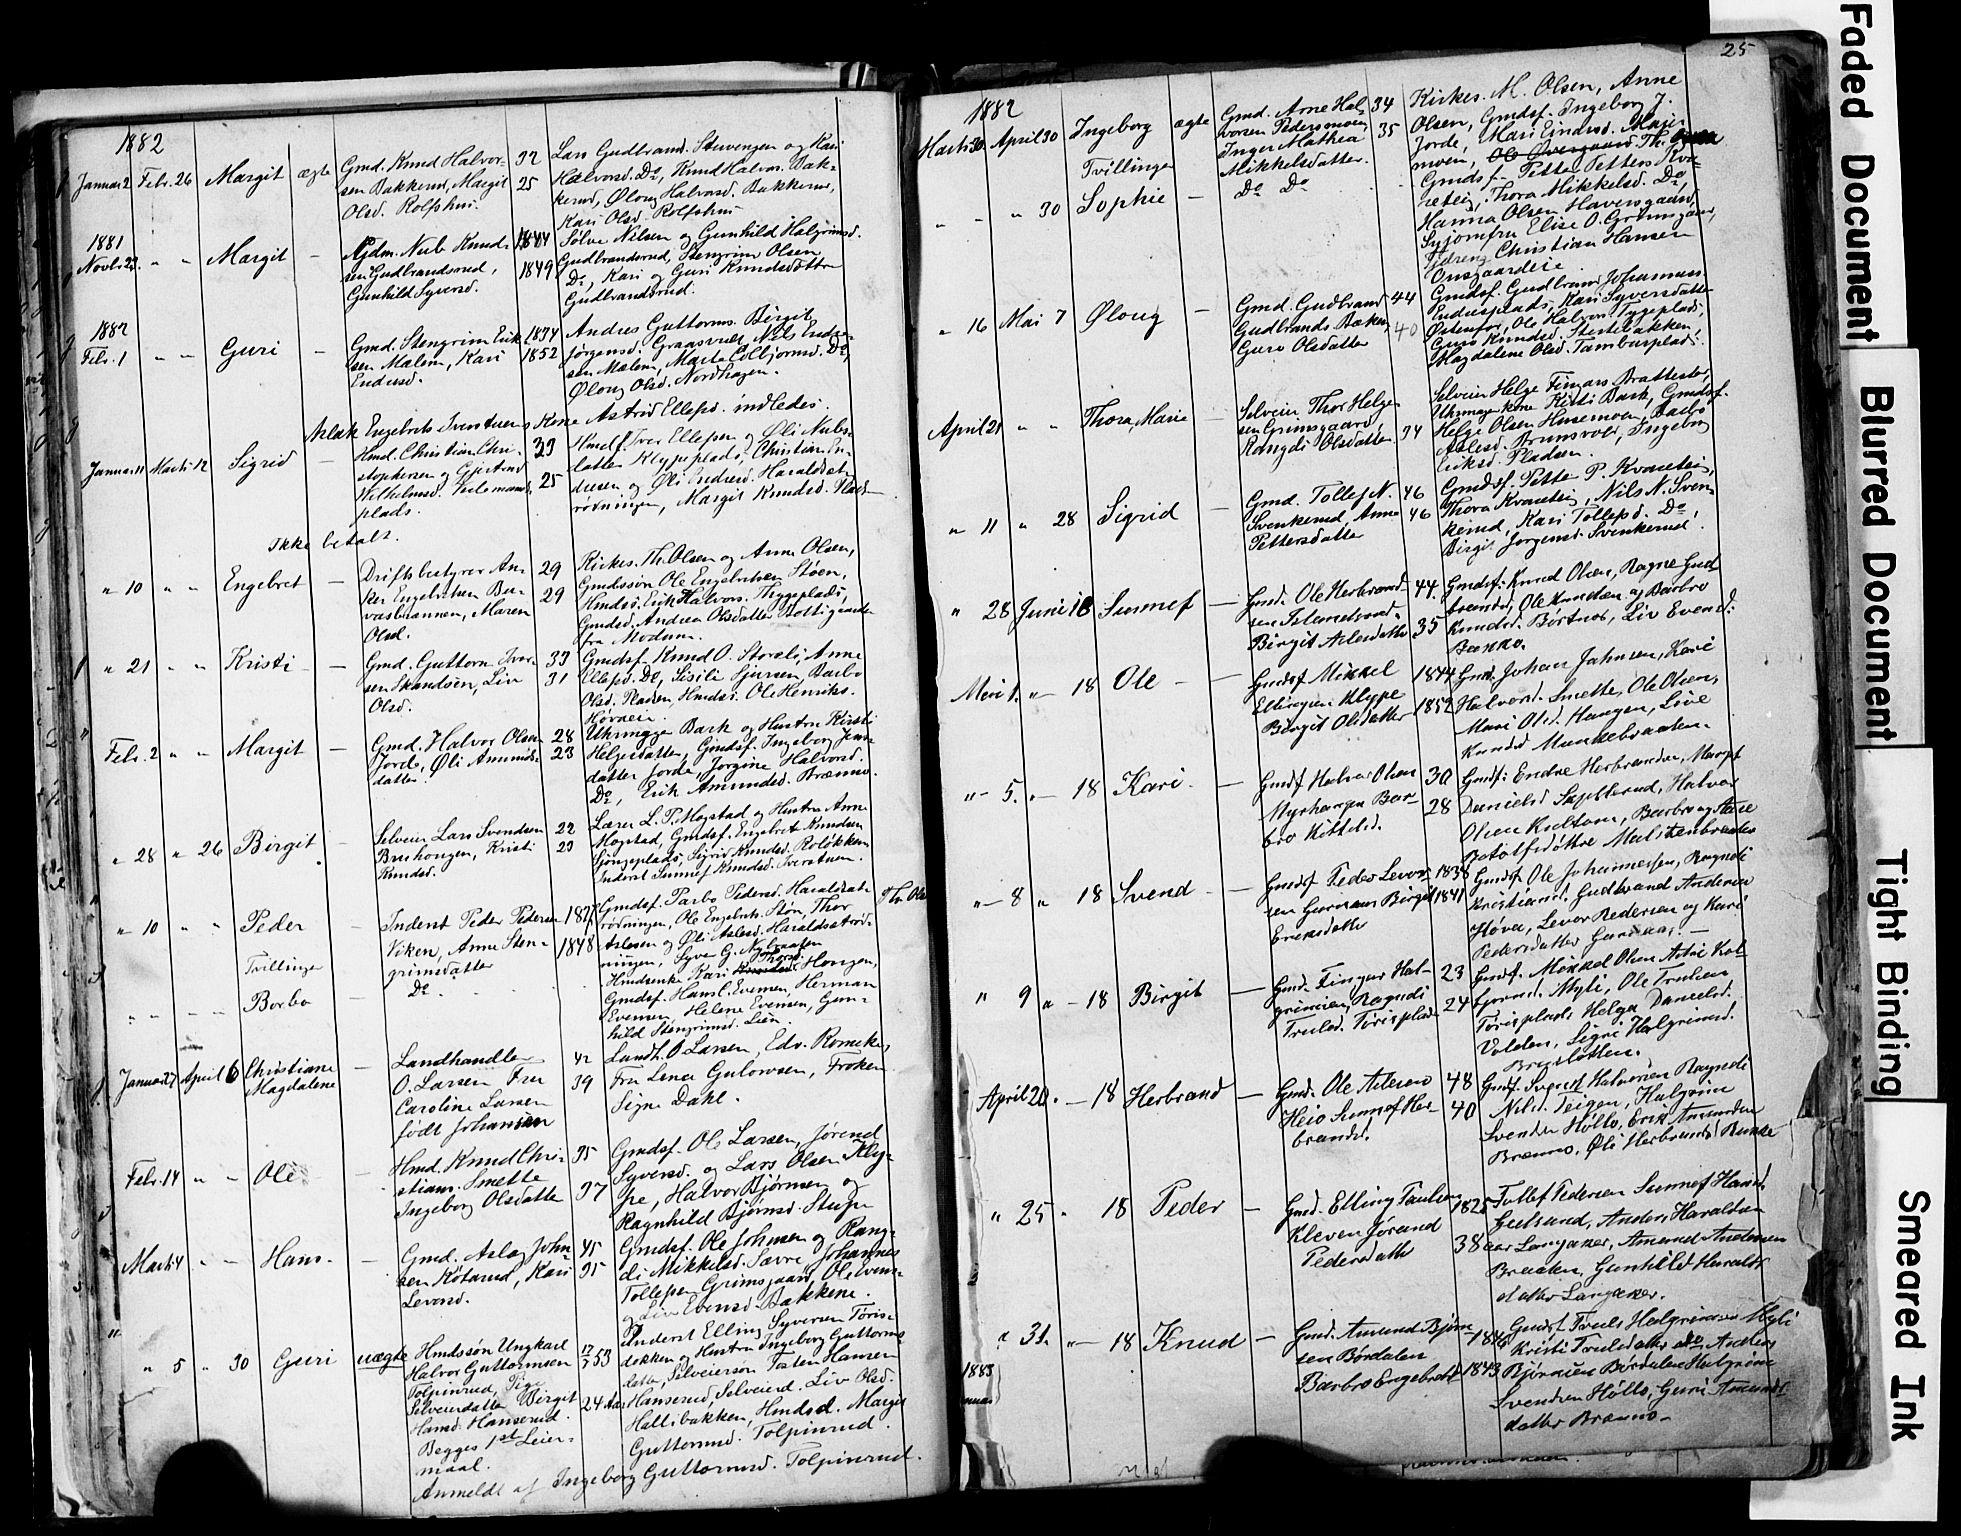 SAKO, Nes kirkebøker, G/Ga/L0002: Klokkerbok nr. I 2, 1872-1912, s. 25